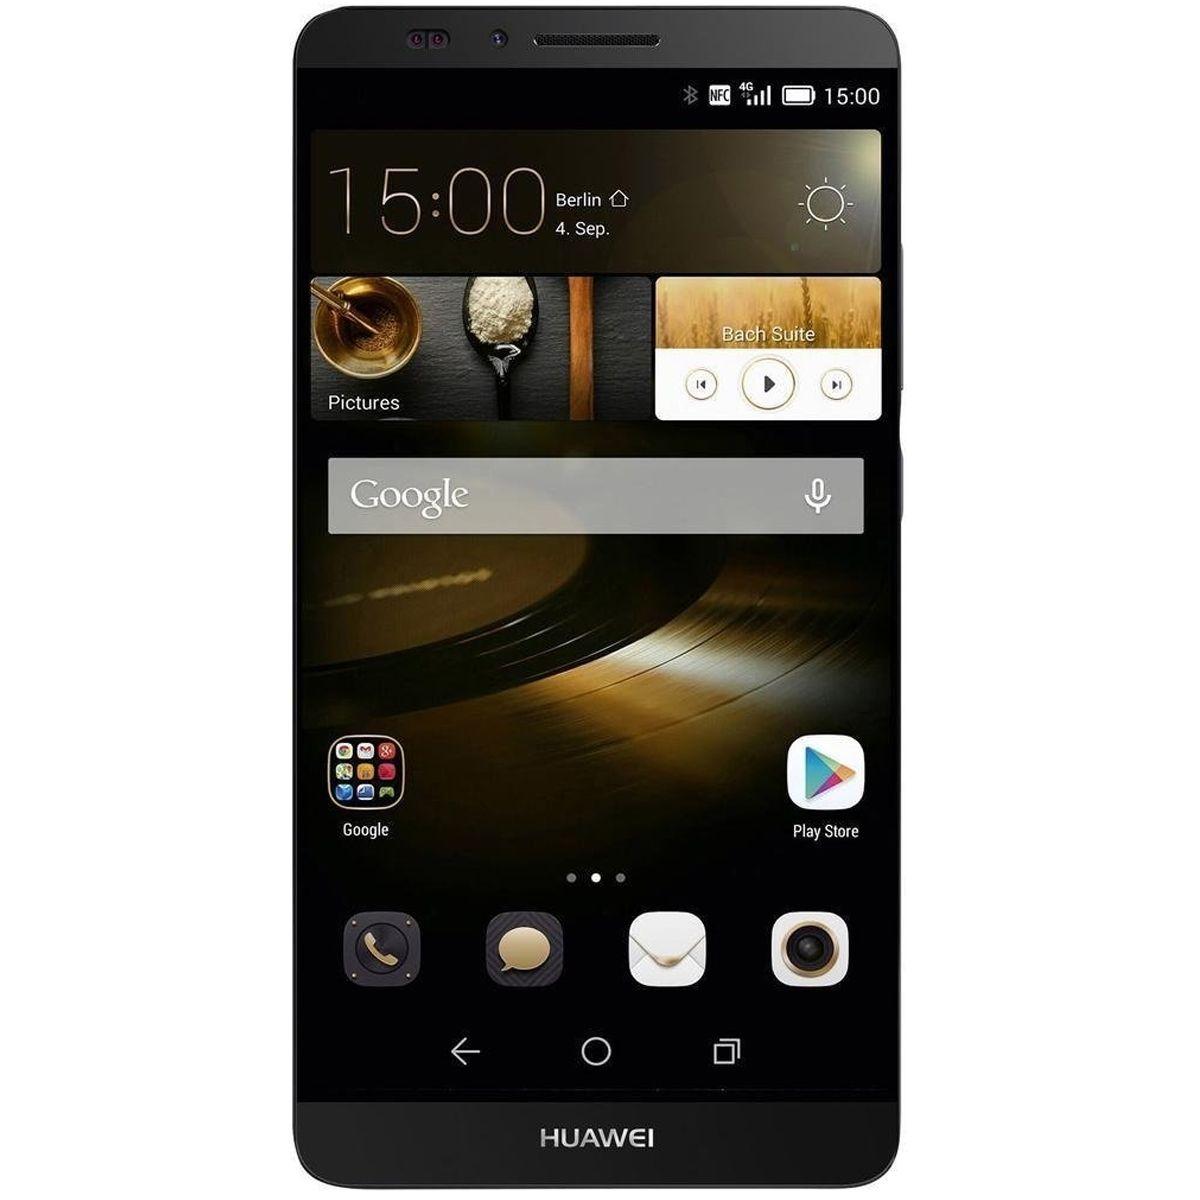 Huawei Ascend Mate 7 4G